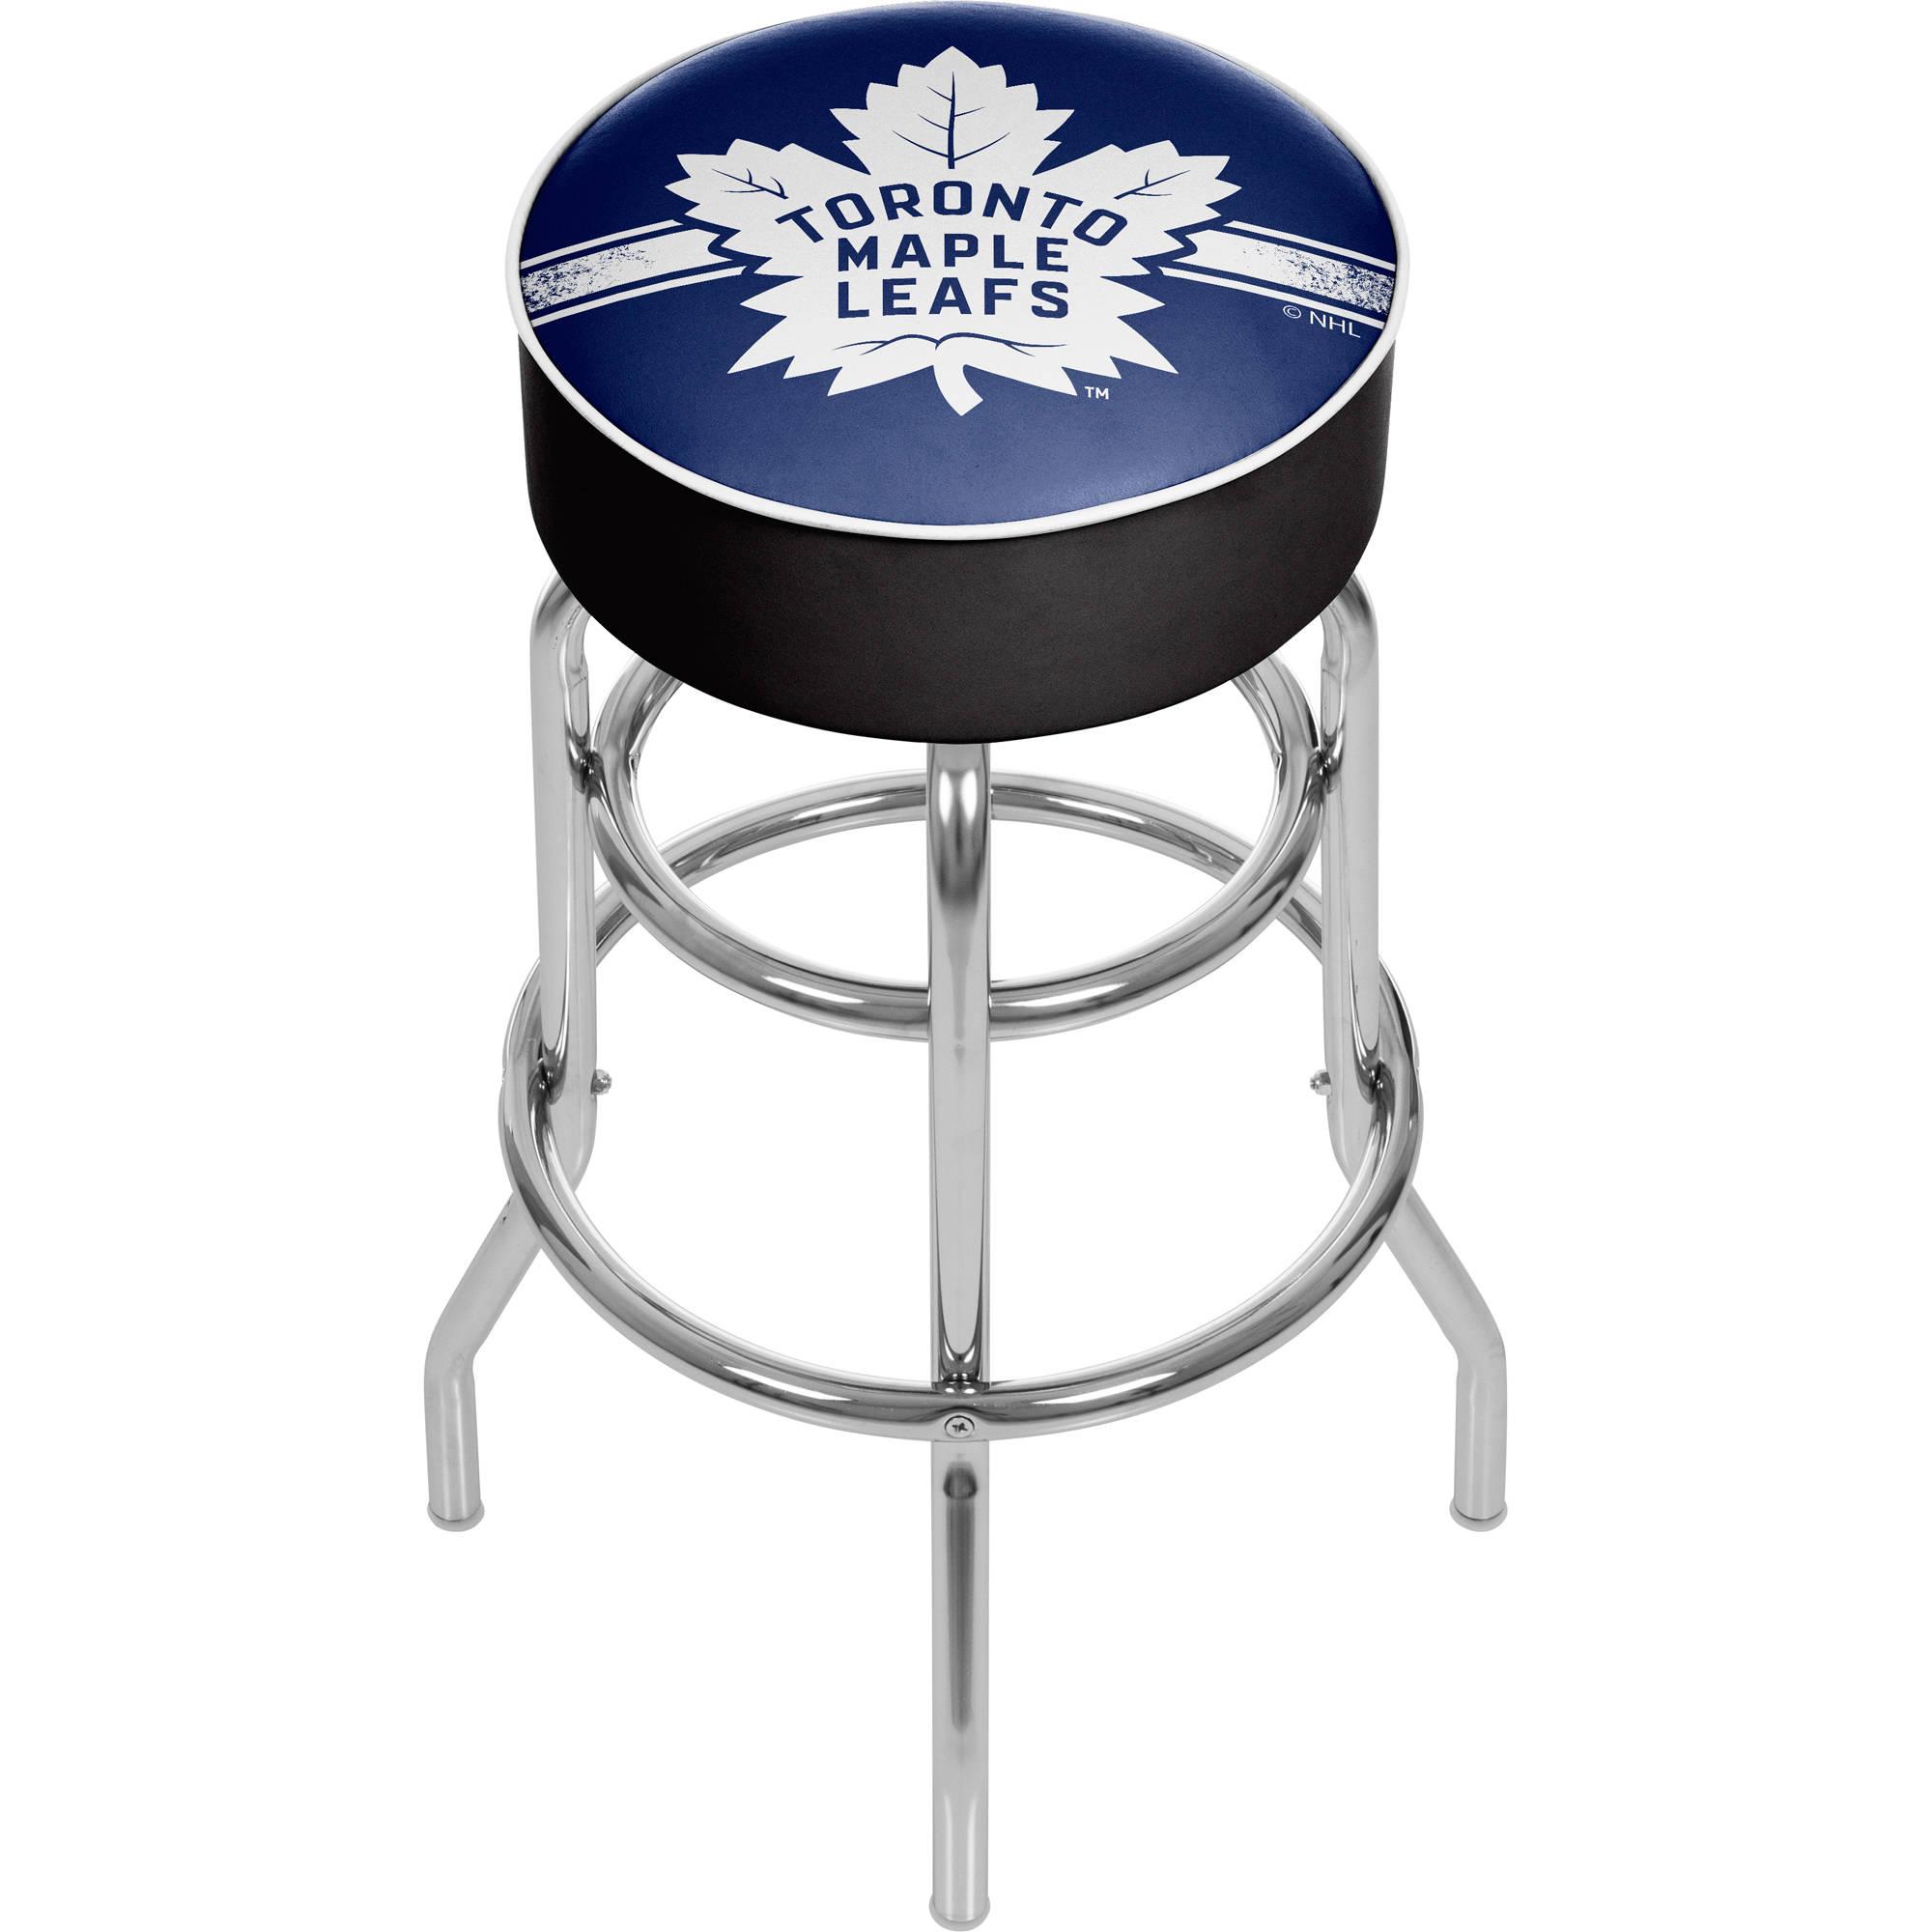 NHL Chrome Bar Stool with Swivel, Toronto Maple Leafs